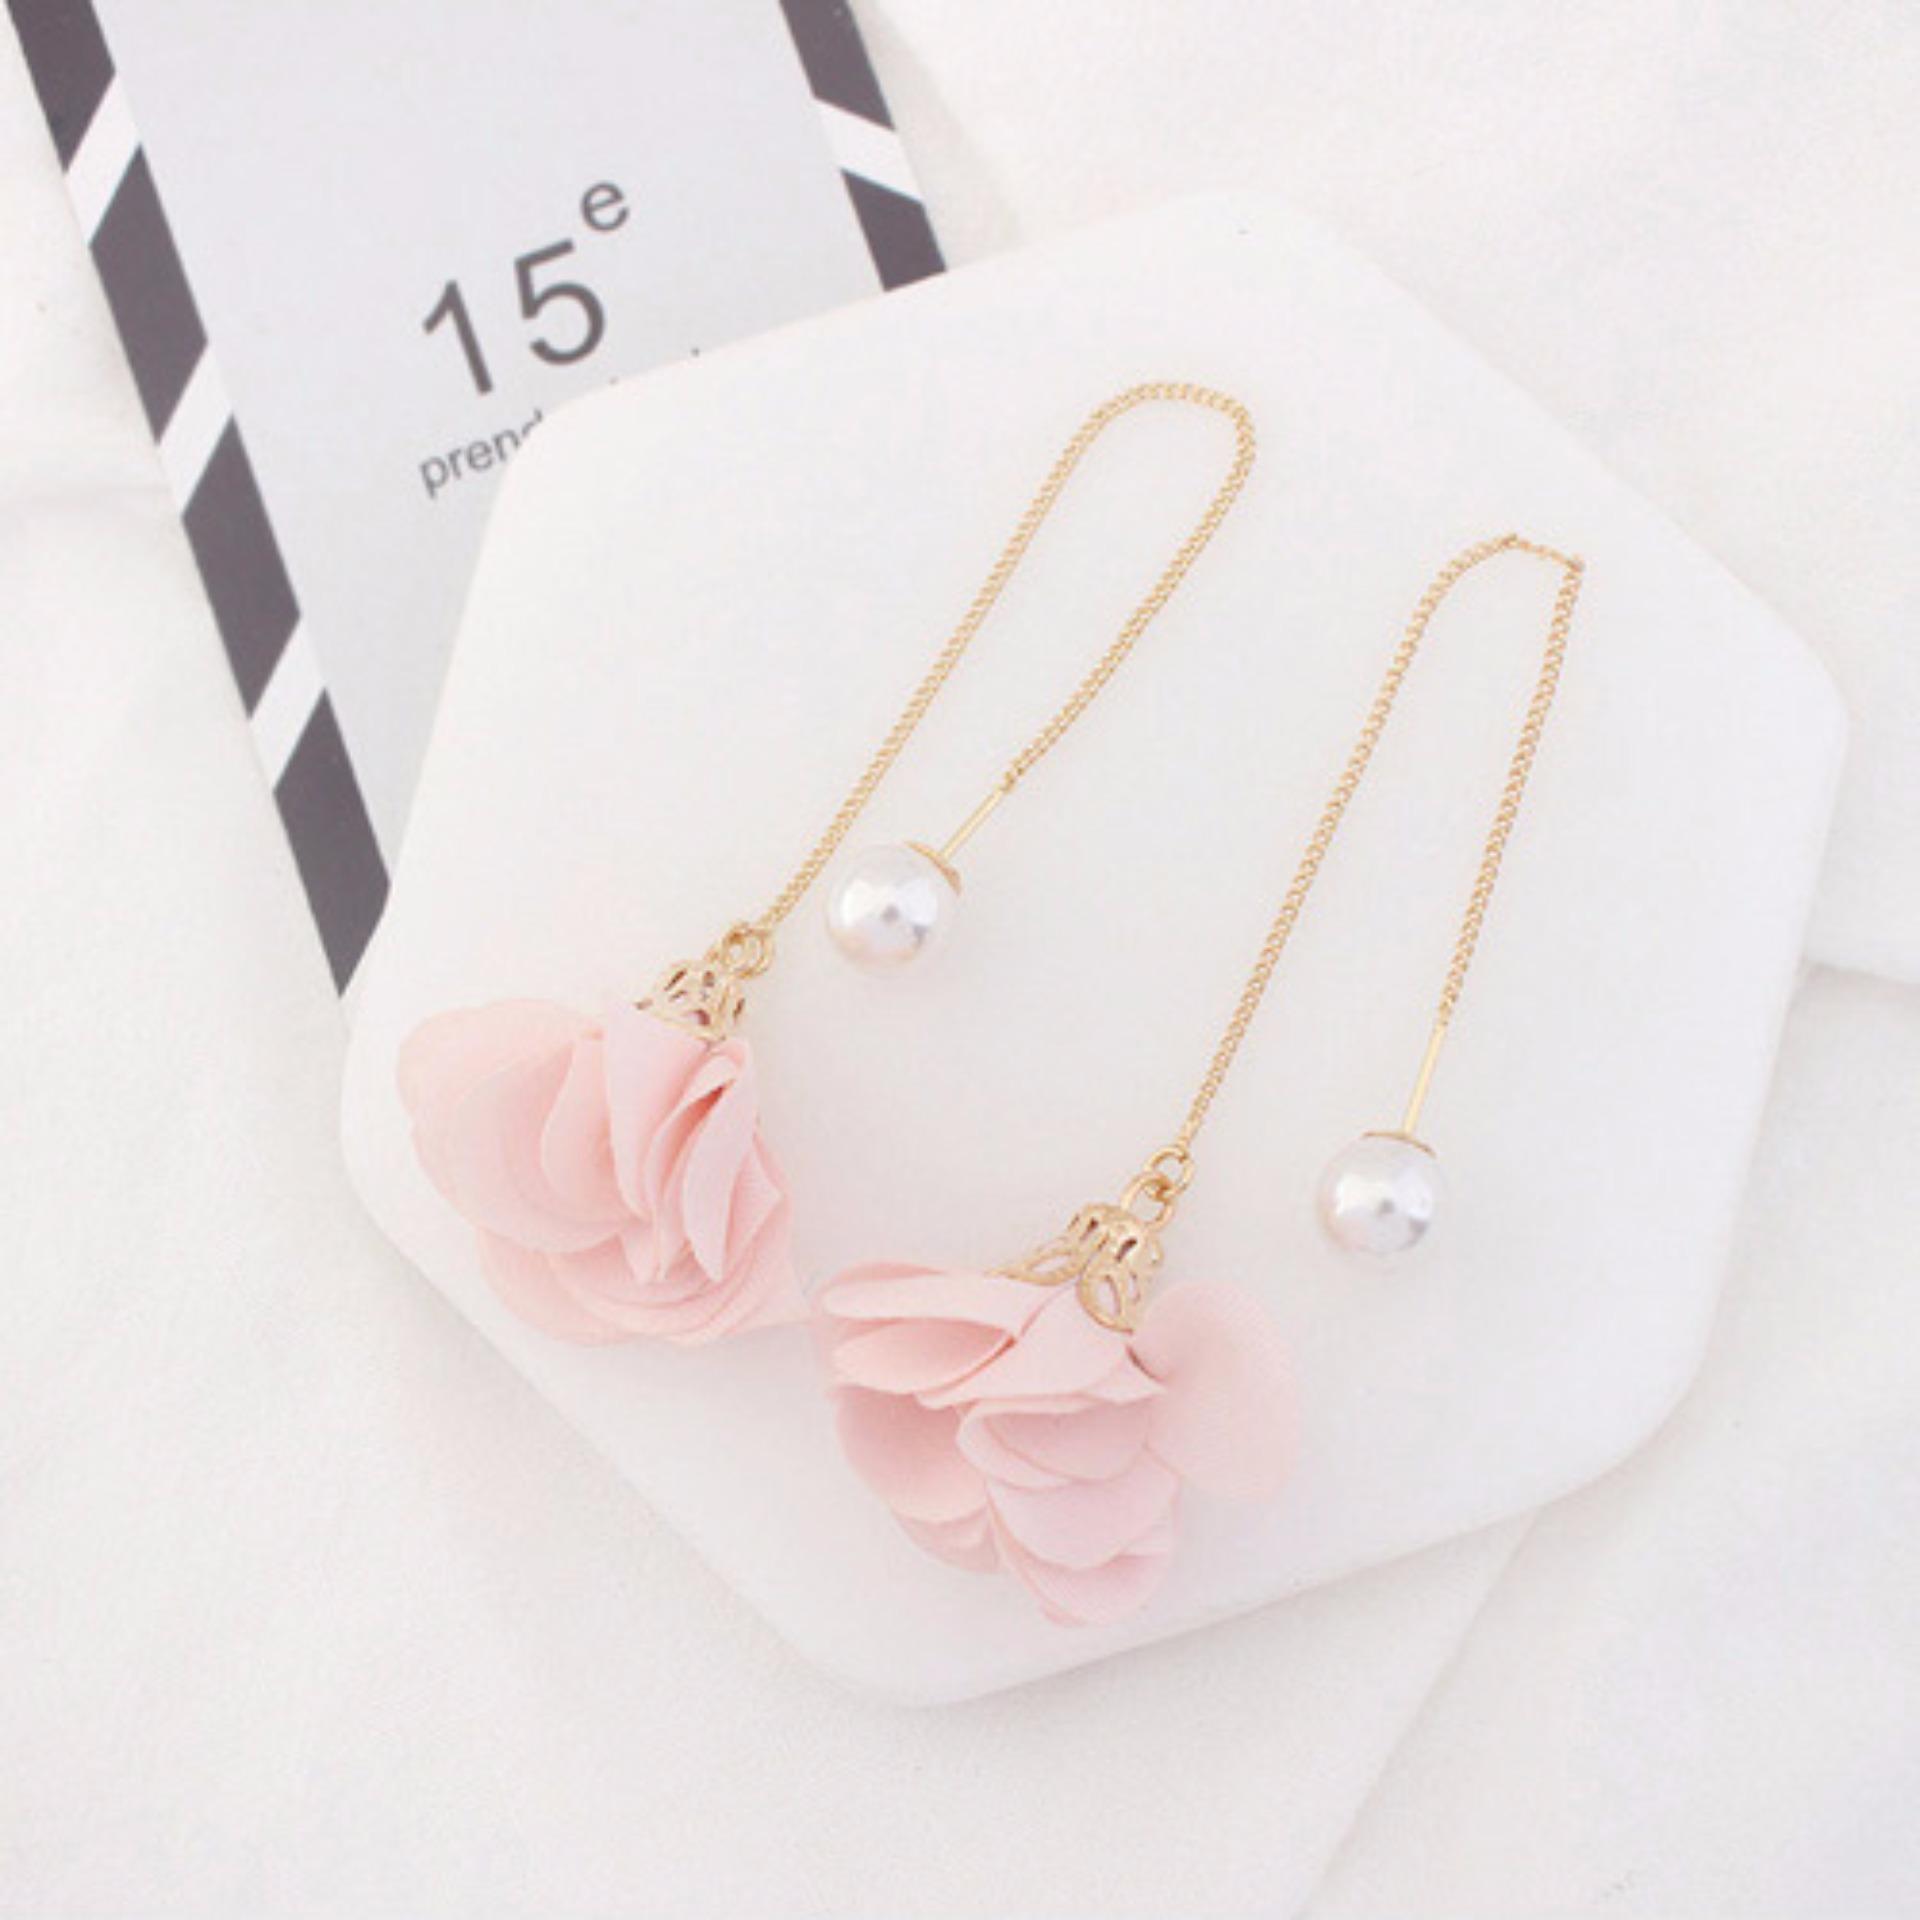 Shock Price LRC Anting Gantung Elegant Pink Flower Shape Decorated Simple Long Chain Earrings penjualan -